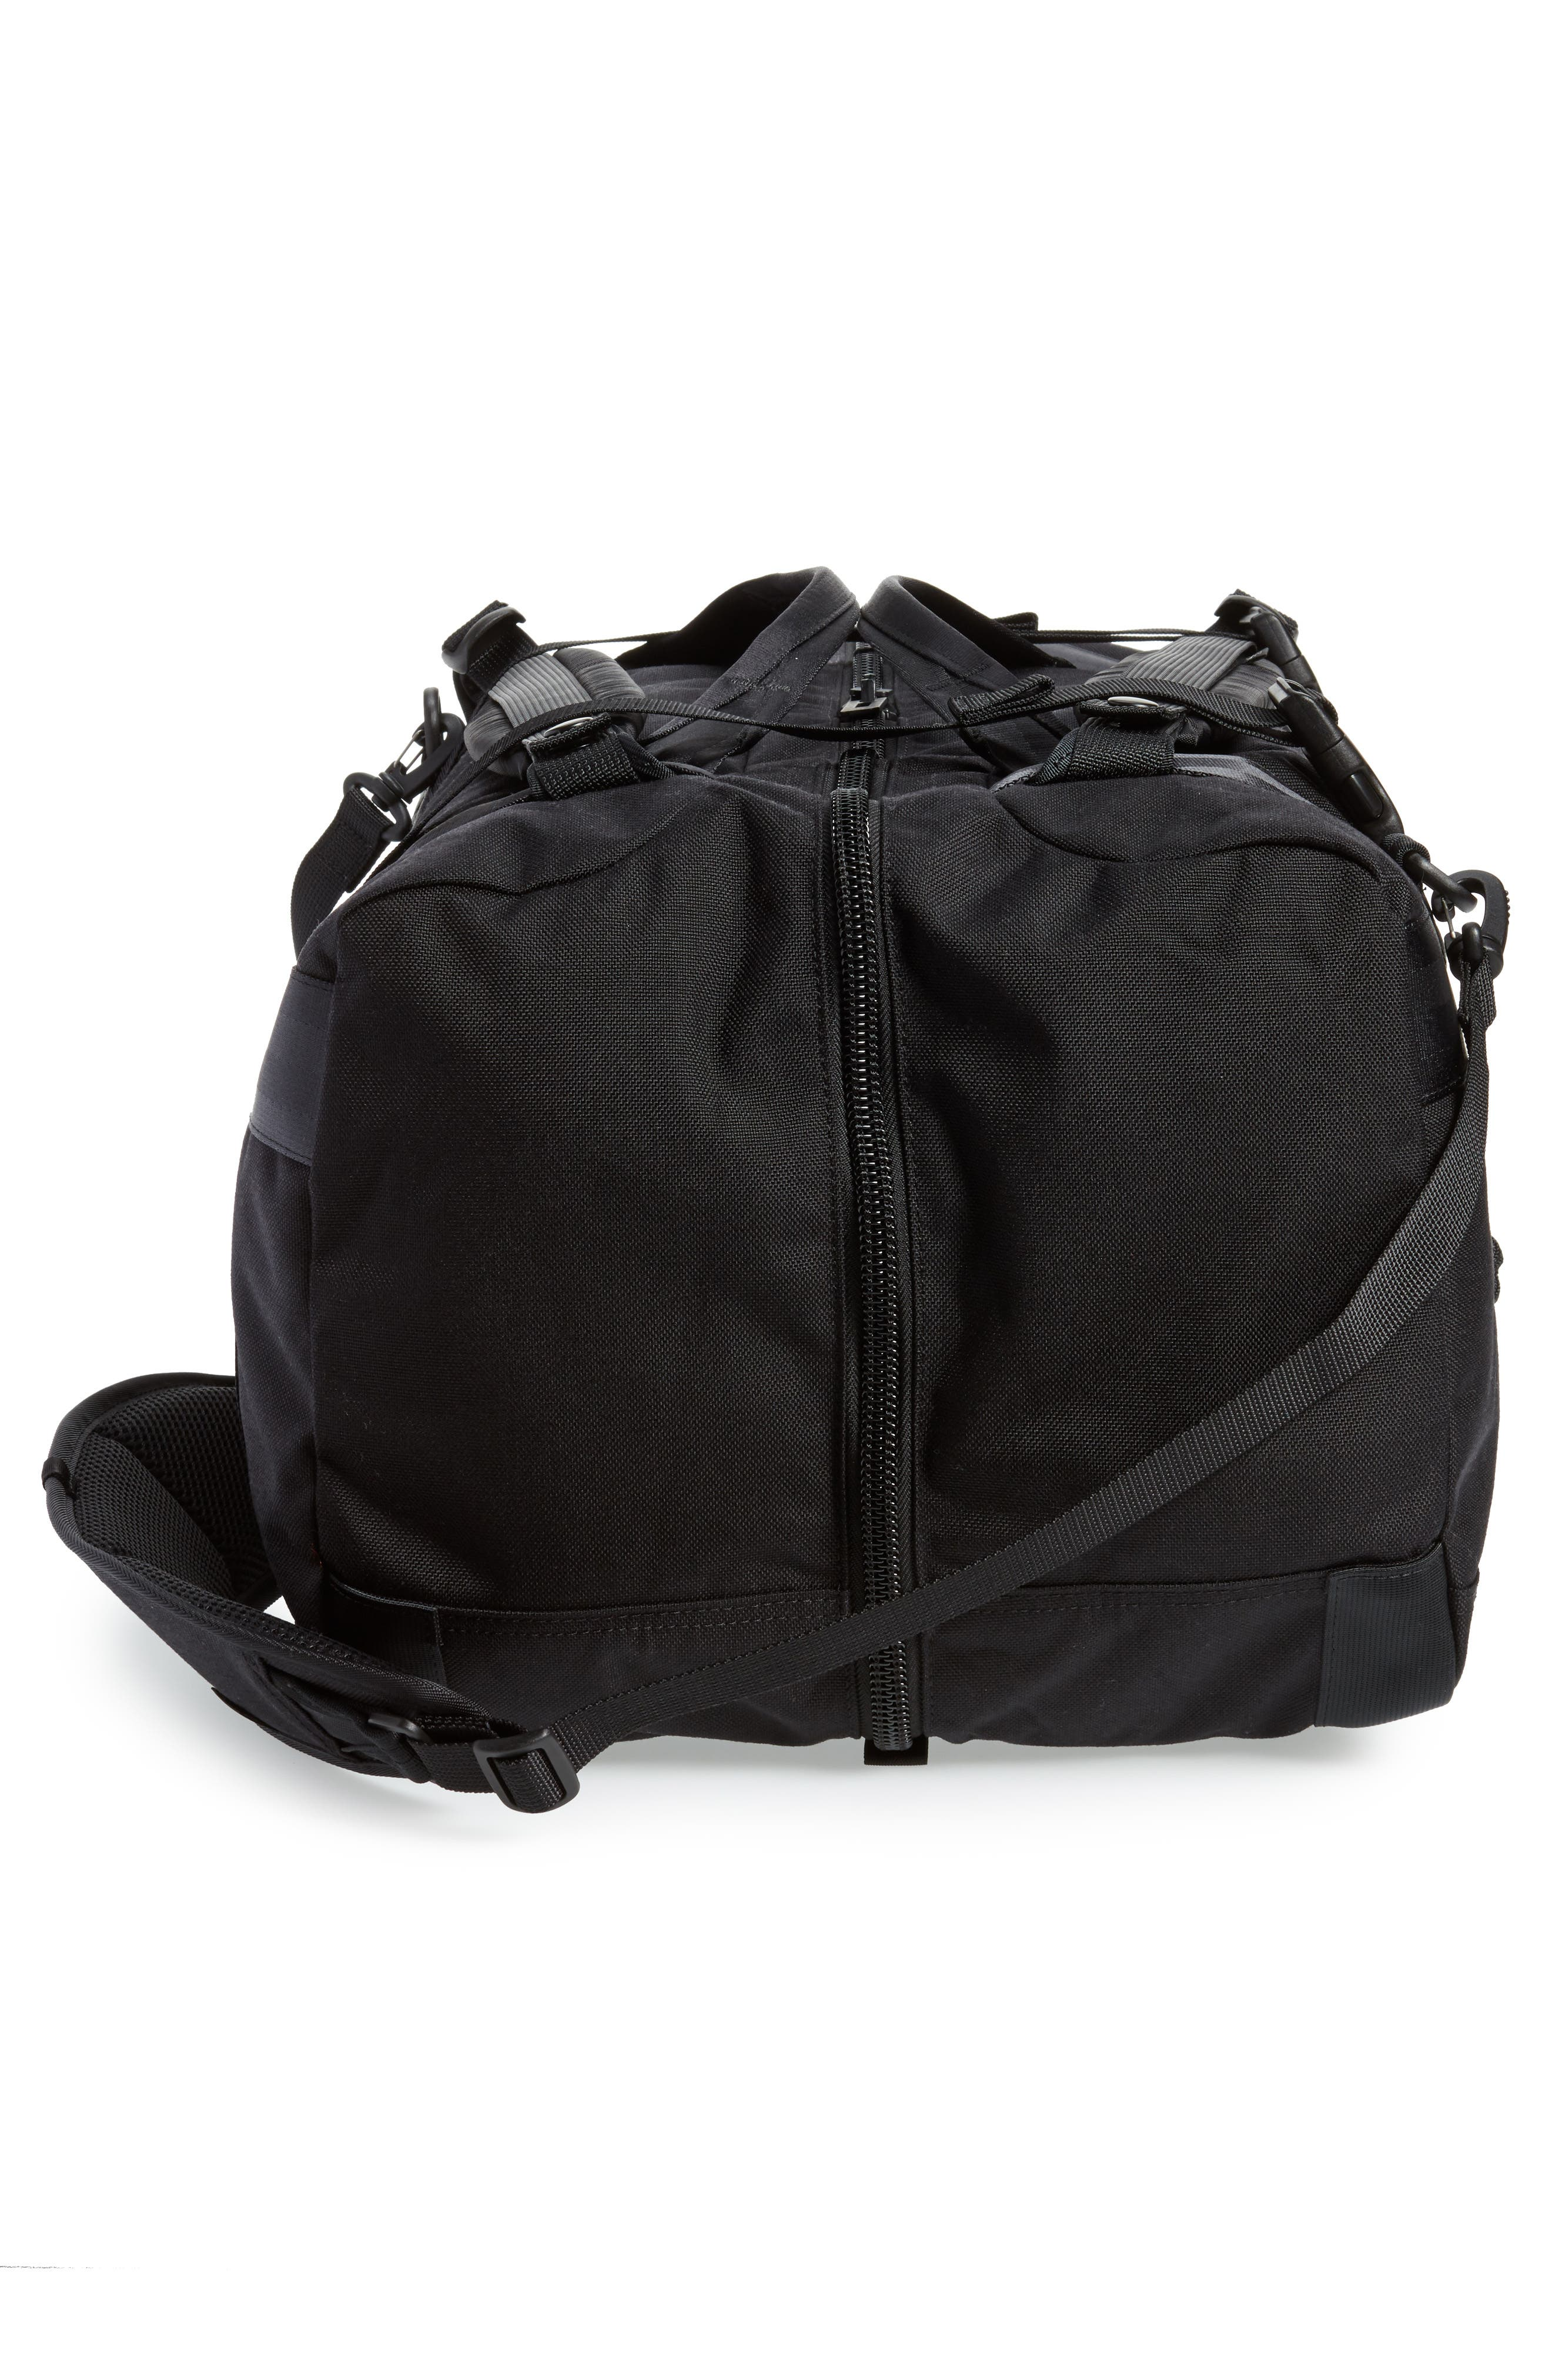 Porter-Yoshida & Co. Boothpack Convertible Duffel Bag,                             Alternate thumbnail 6, color,                             Black